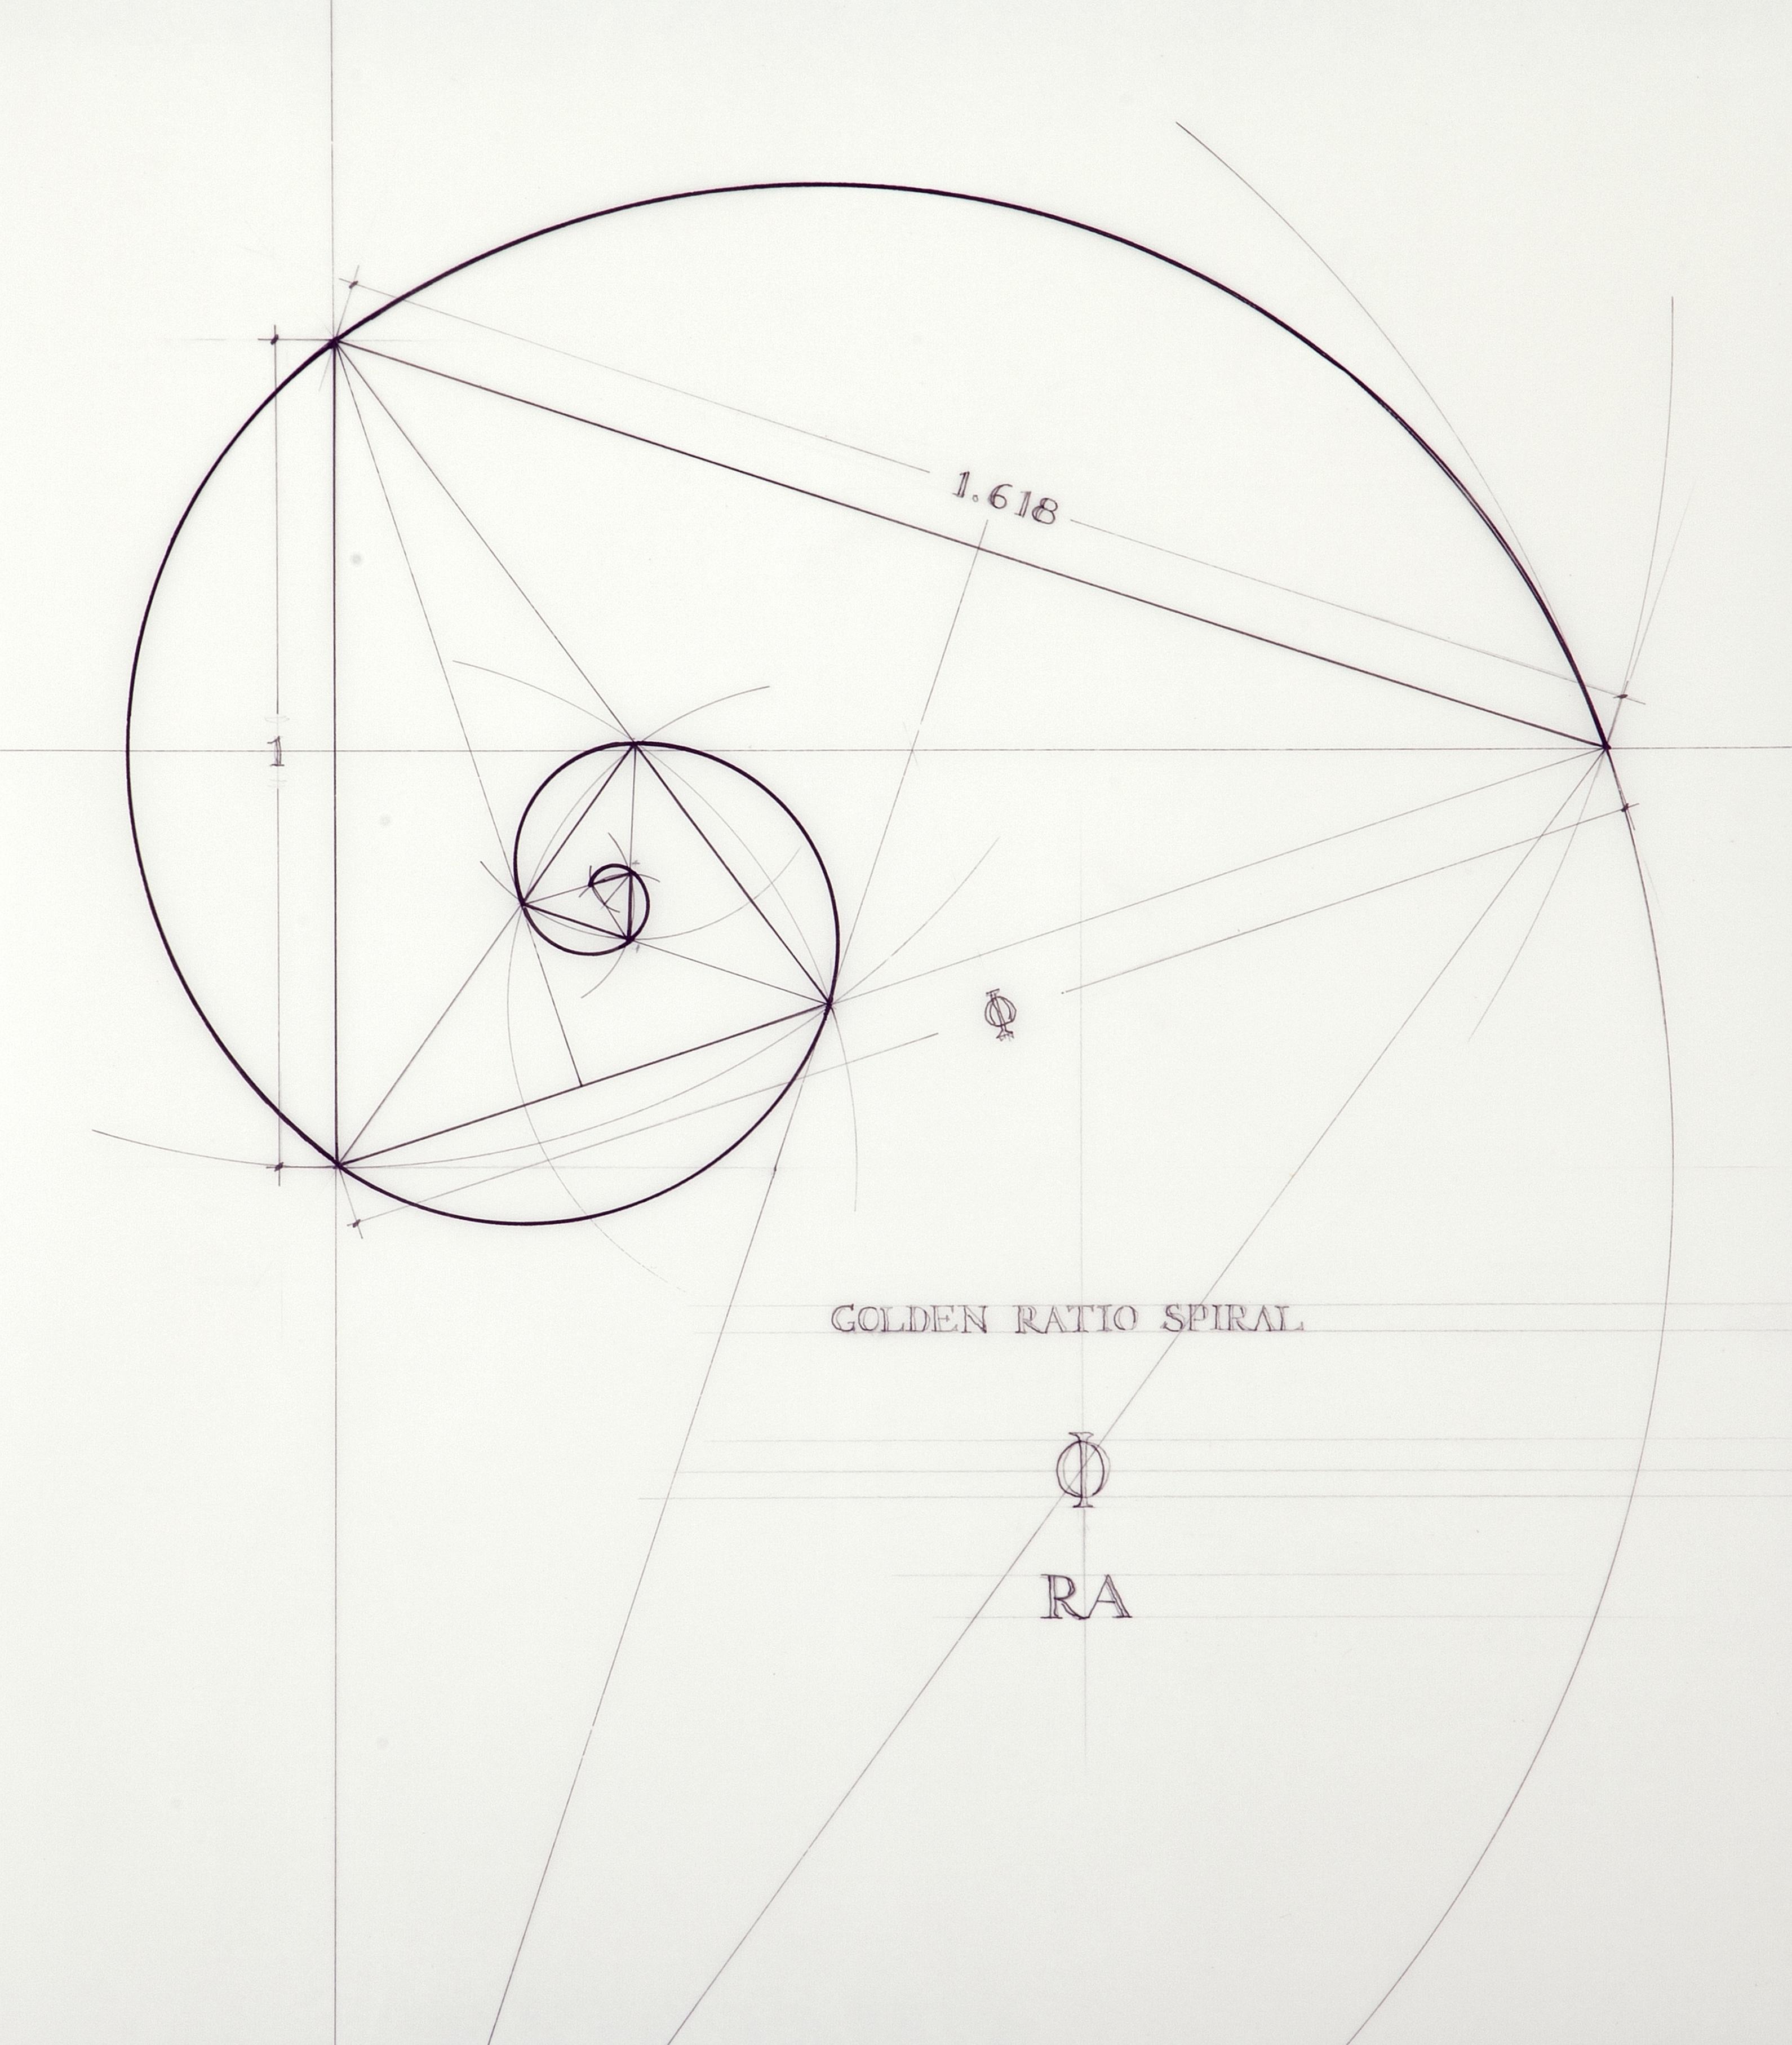 Rafael Araujo Draws Perfect Illustrations By Hand Using Math's Golden Ratio   Inverse